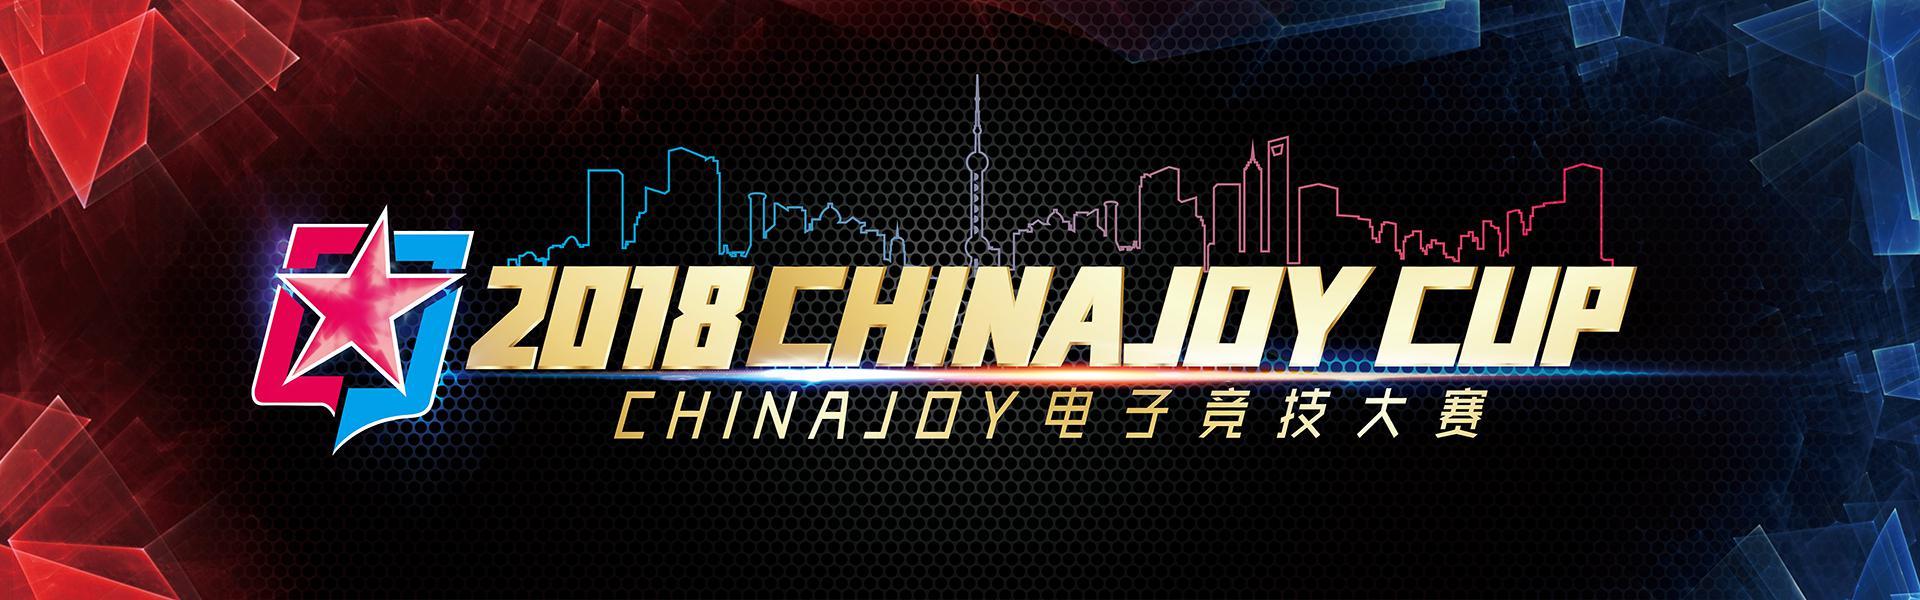 2018ChinaJoy电竞大赛福建赛区开赛